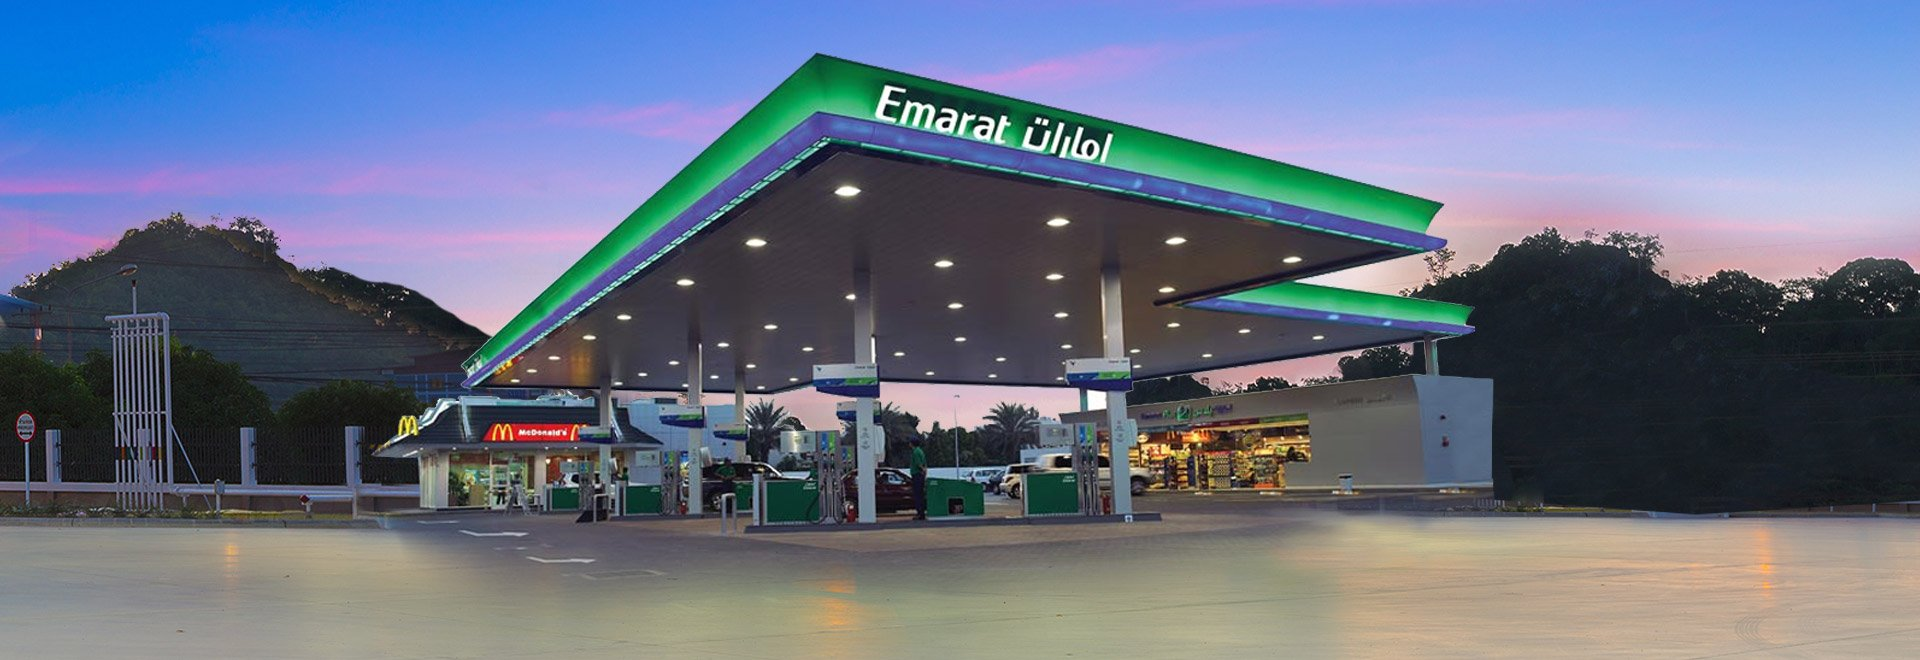 petrol price UAE